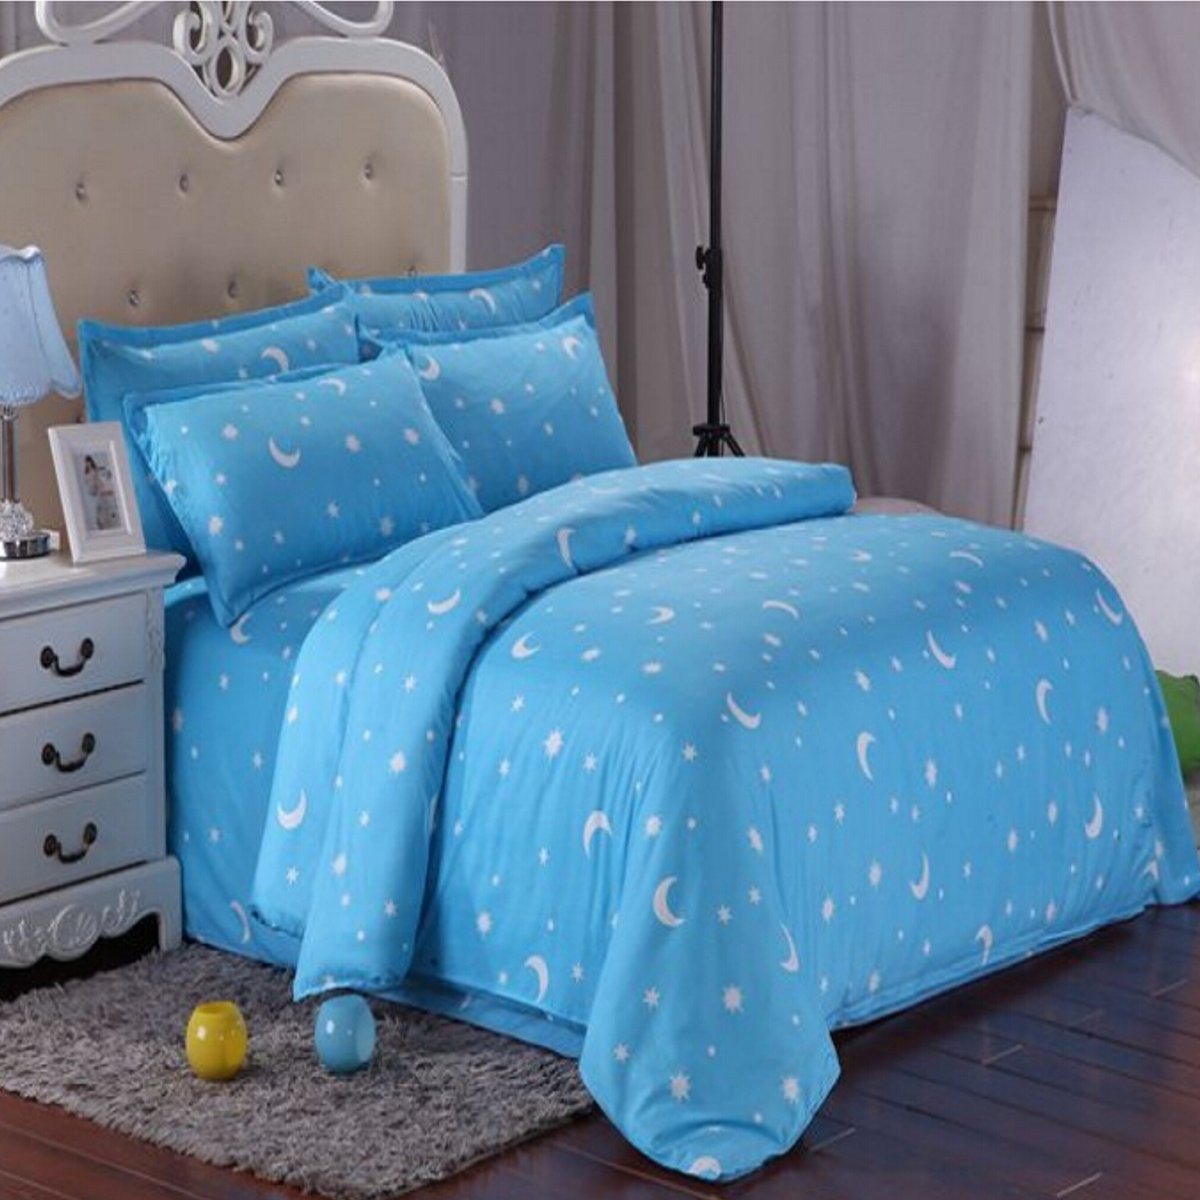 Cotton Blue Stars Moon Printing Bedding Set Bed Sheet